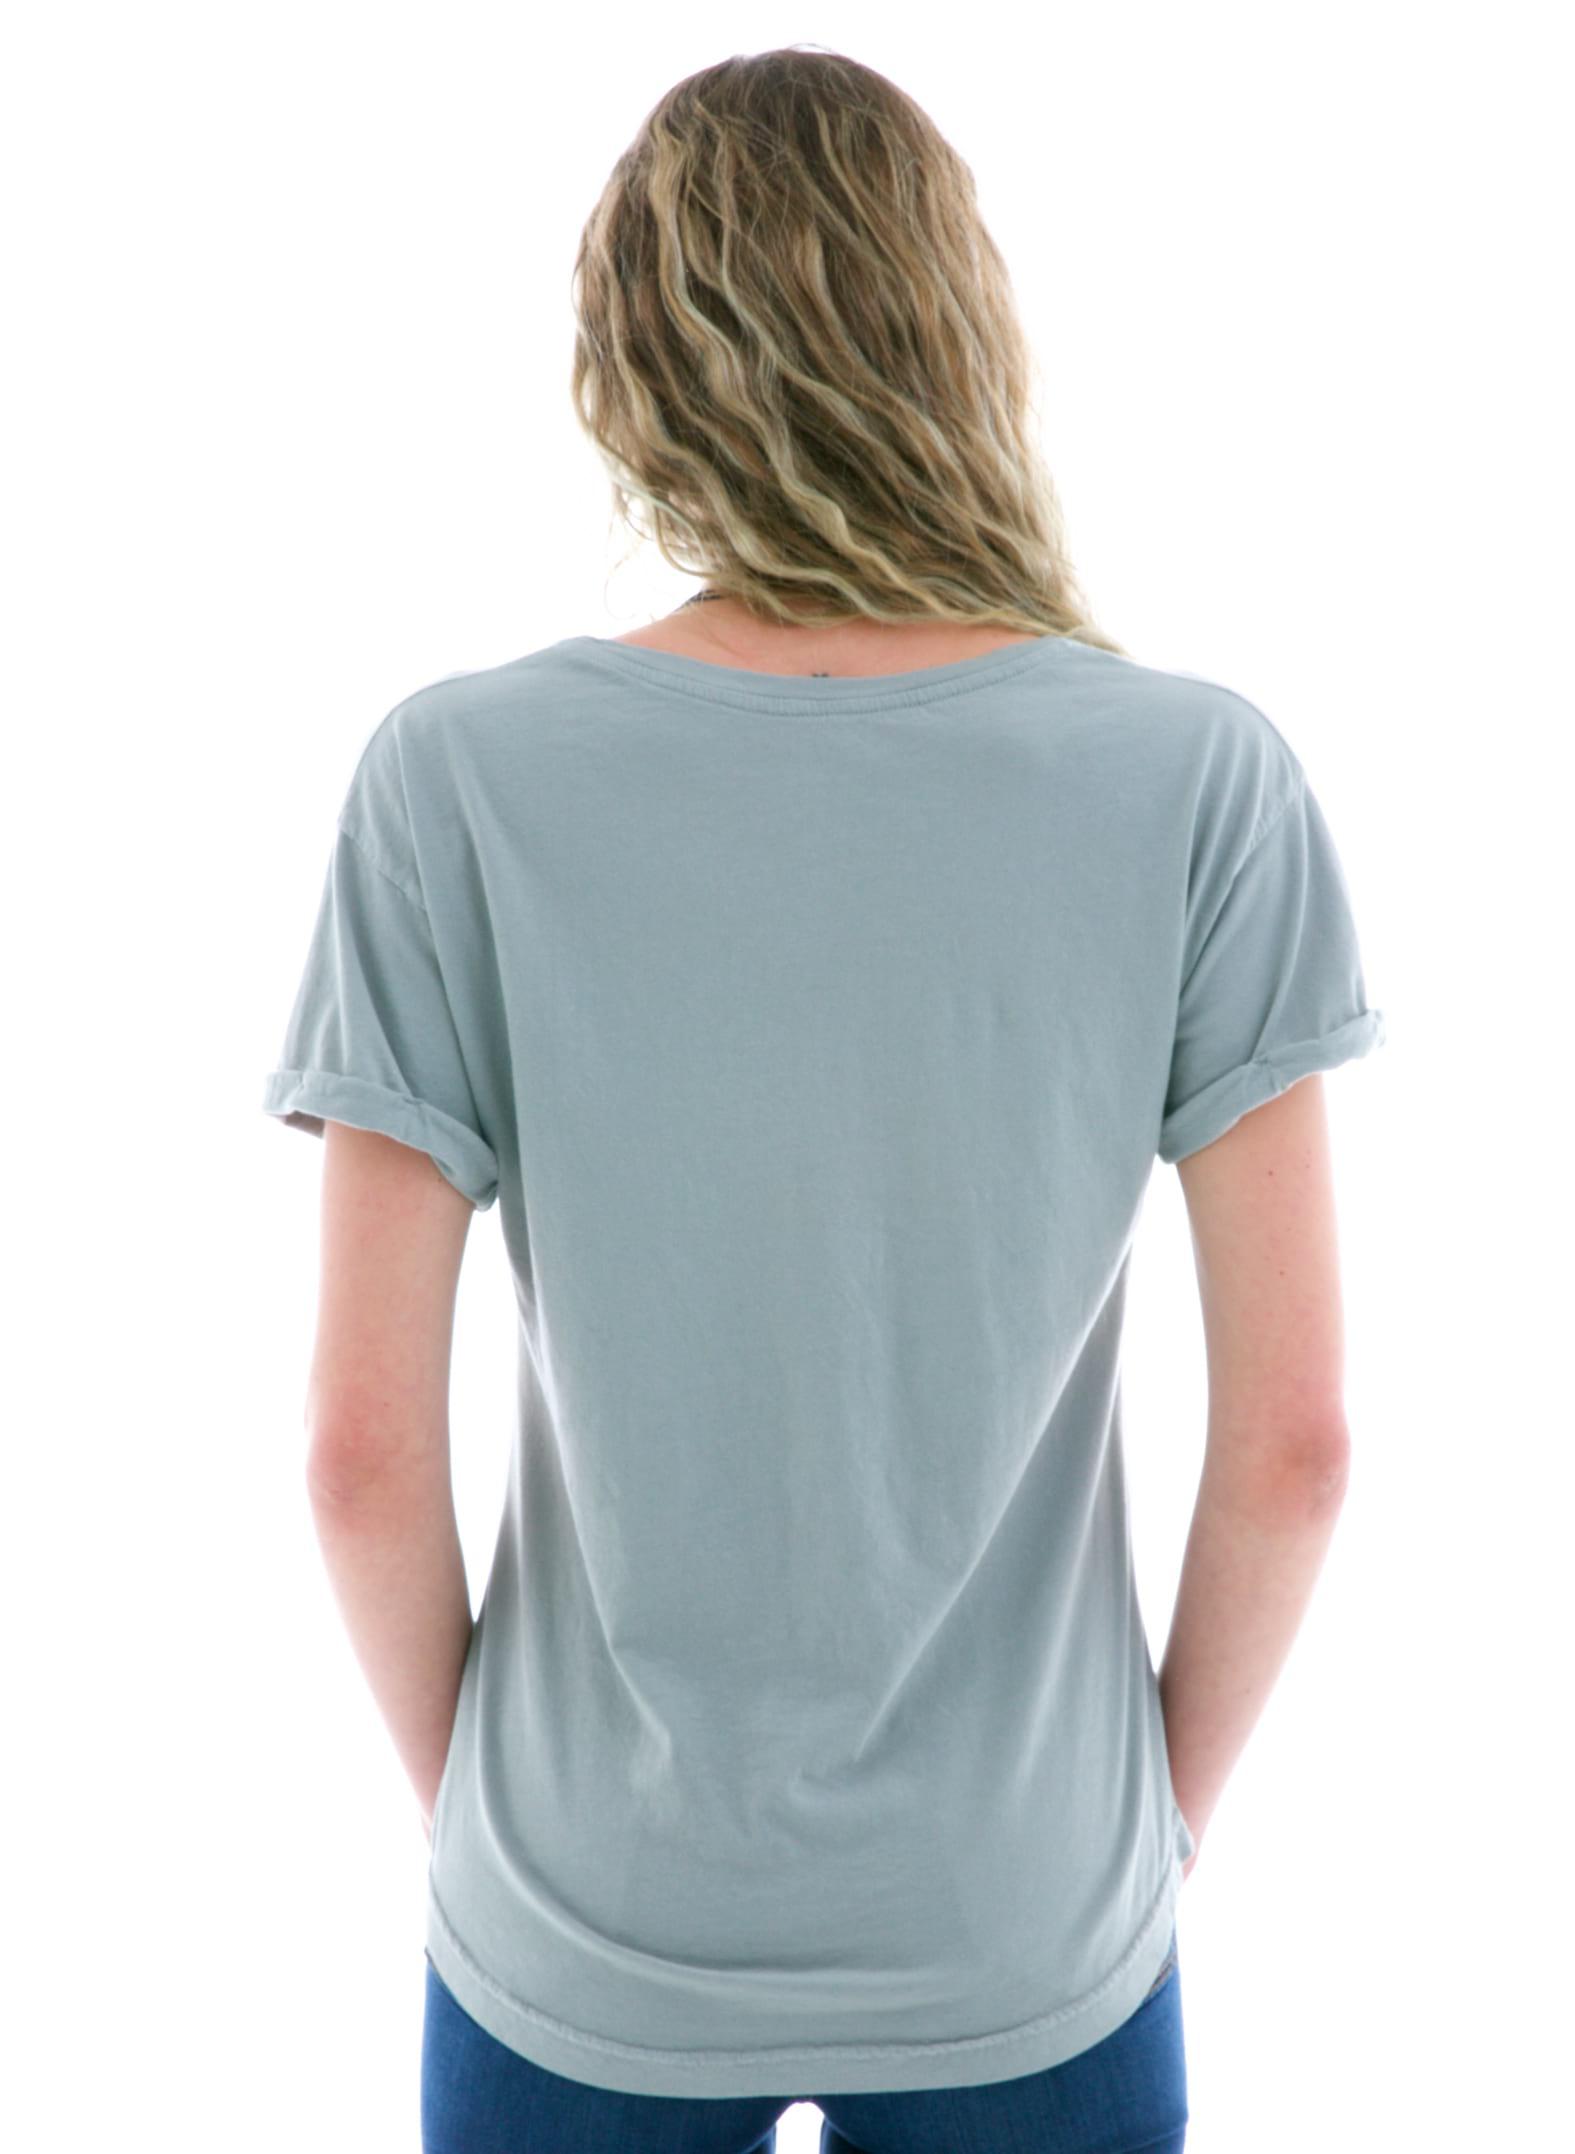 Boyfriend Rollup Crew Short Sleeve T-Shirt Back View